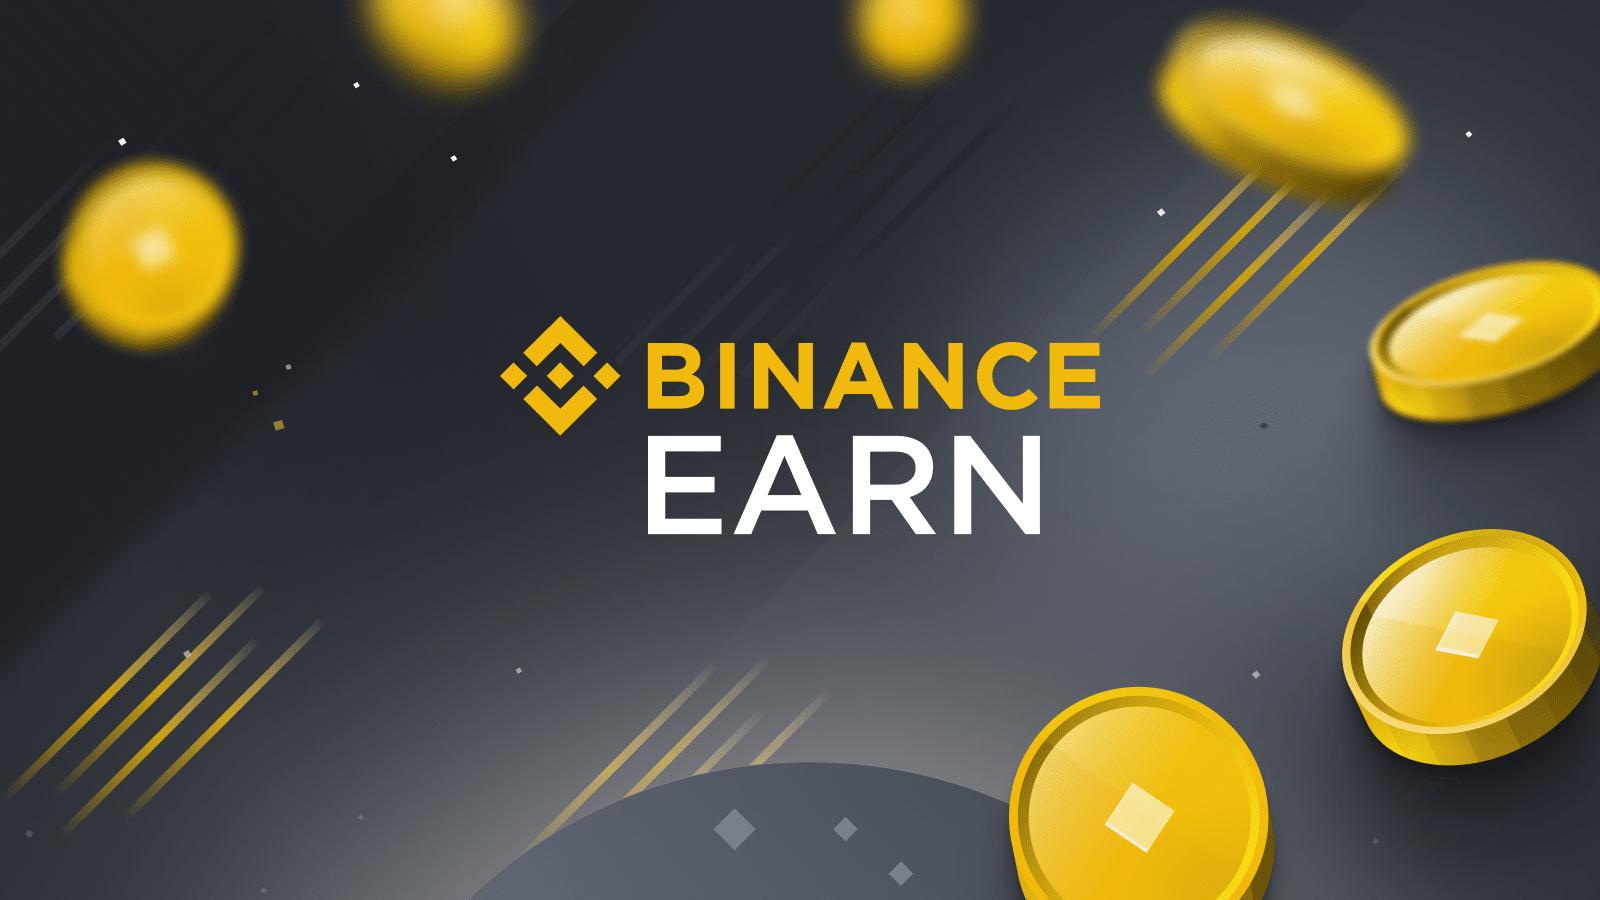 binance earn